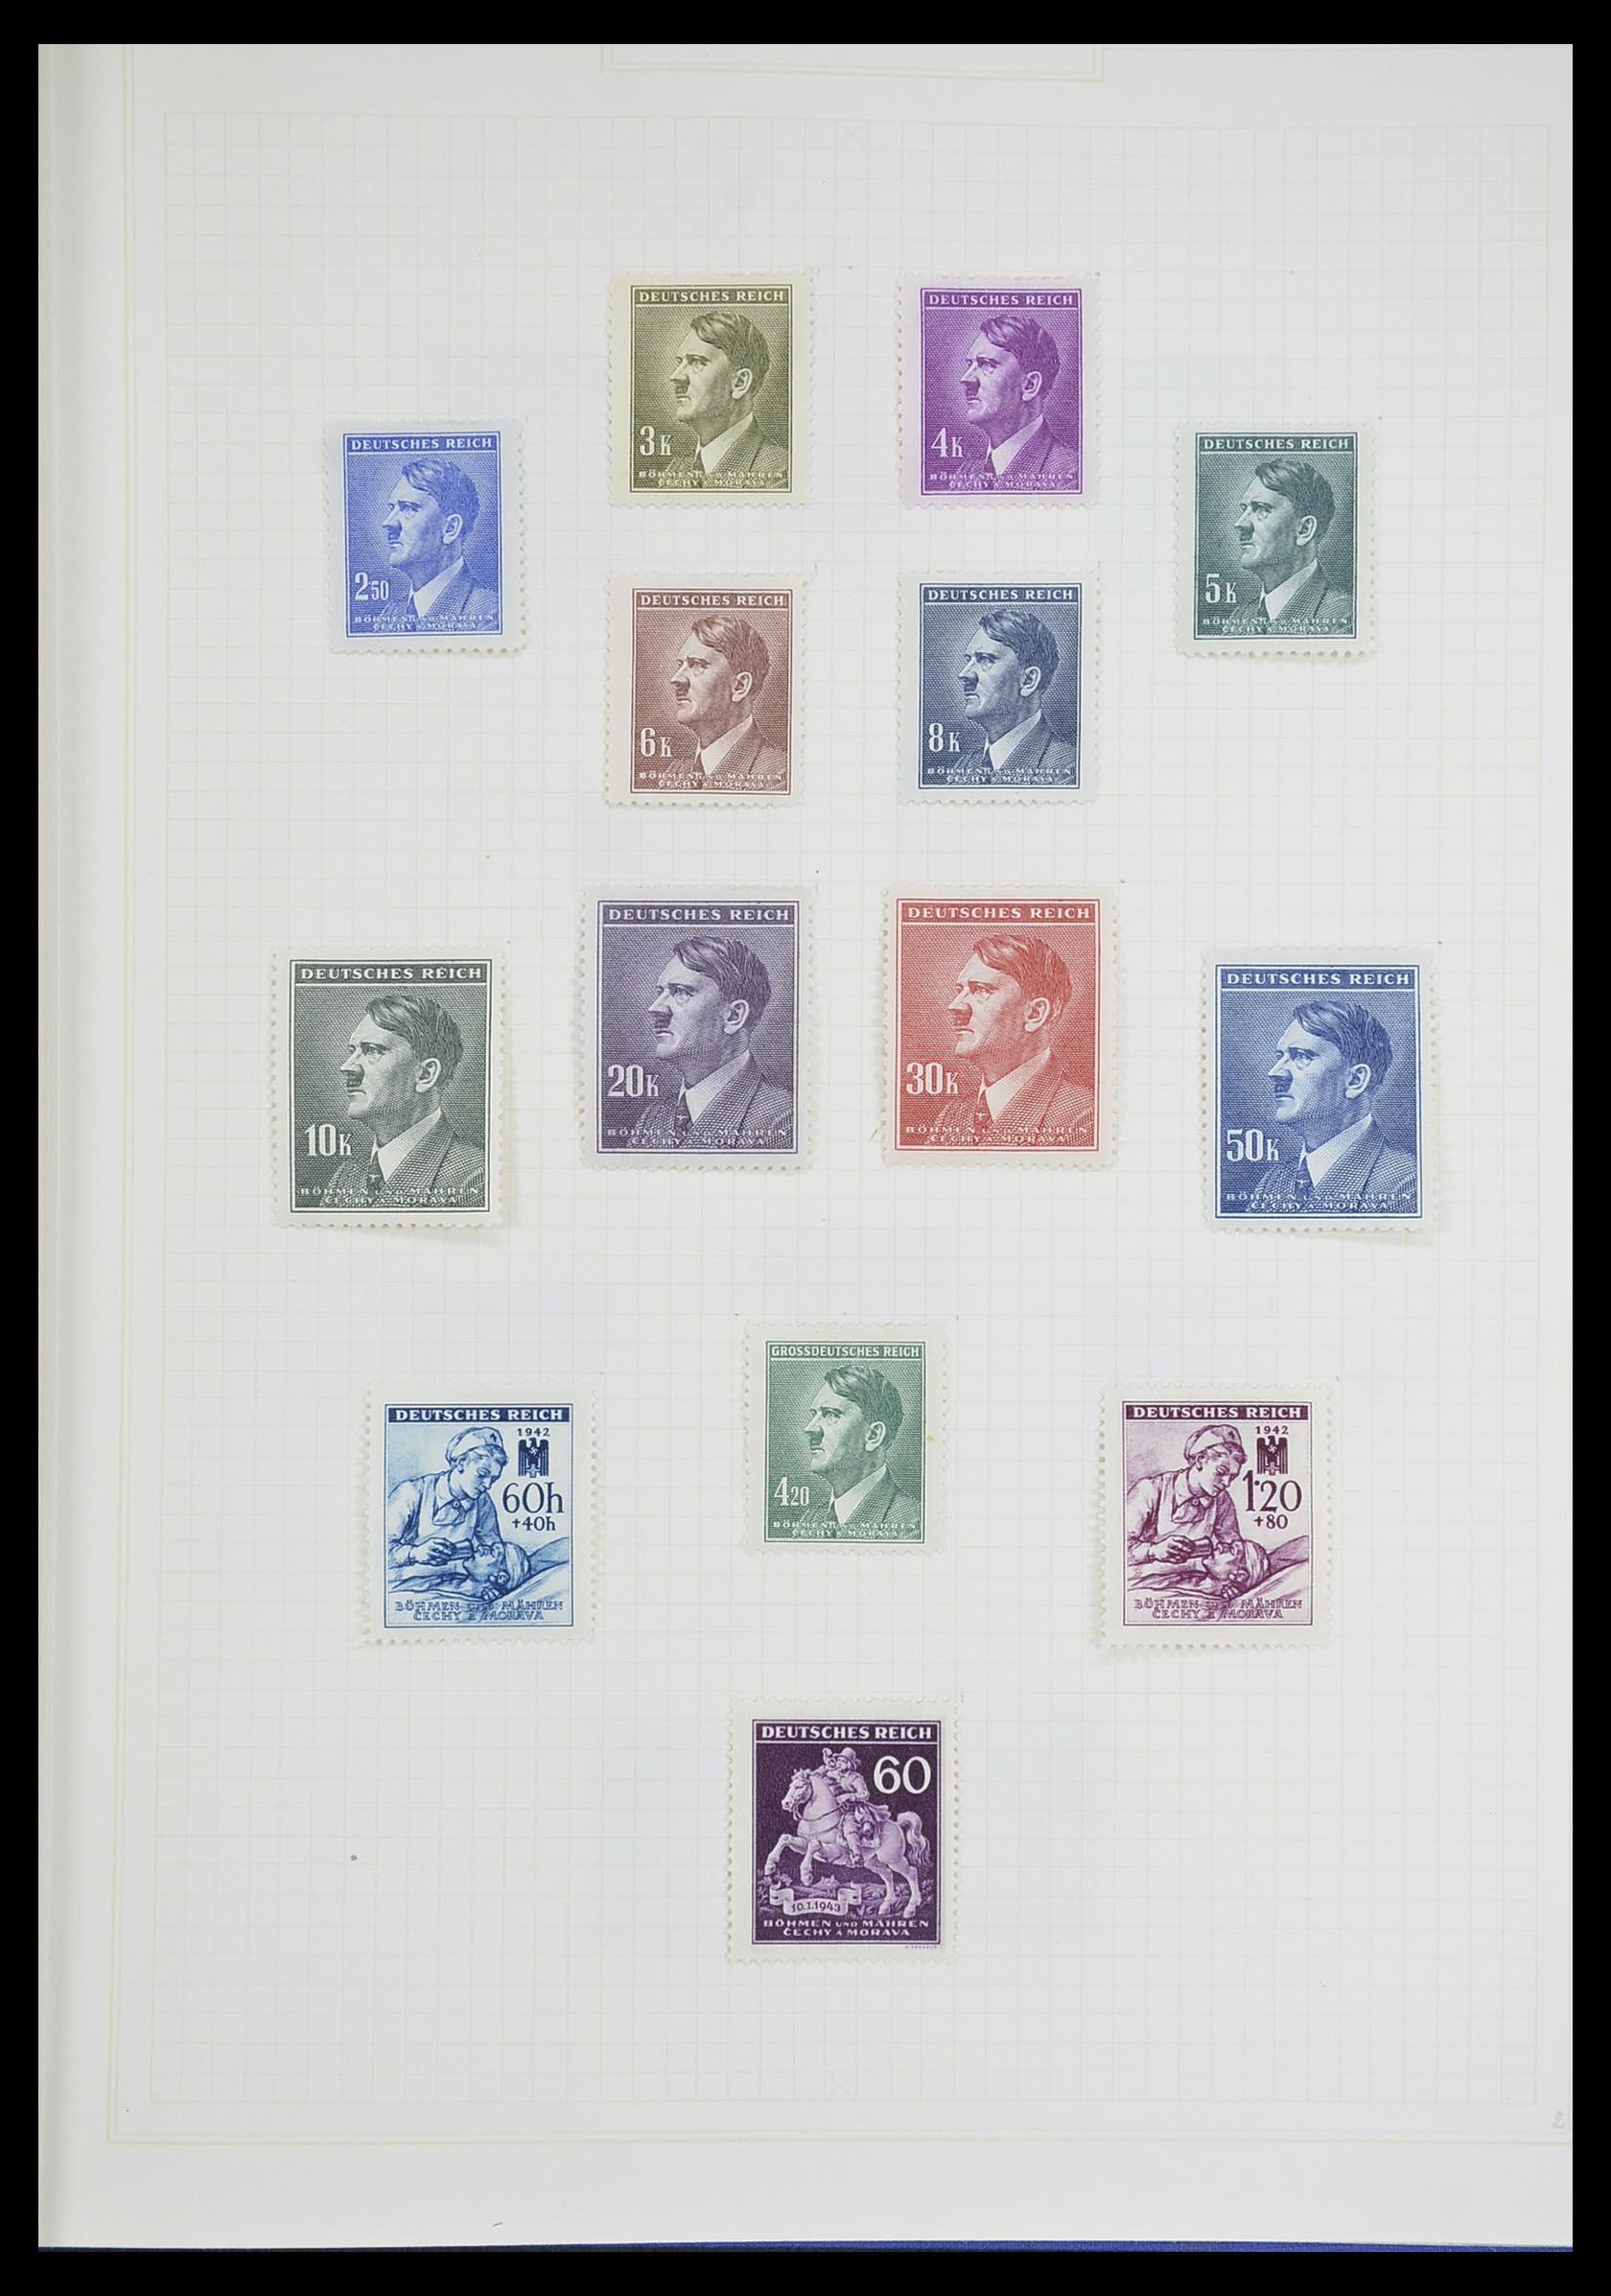 33713 018 - Postzegelverzameling 33713 Duitse bezettingen WO I en WO II 1914-1945